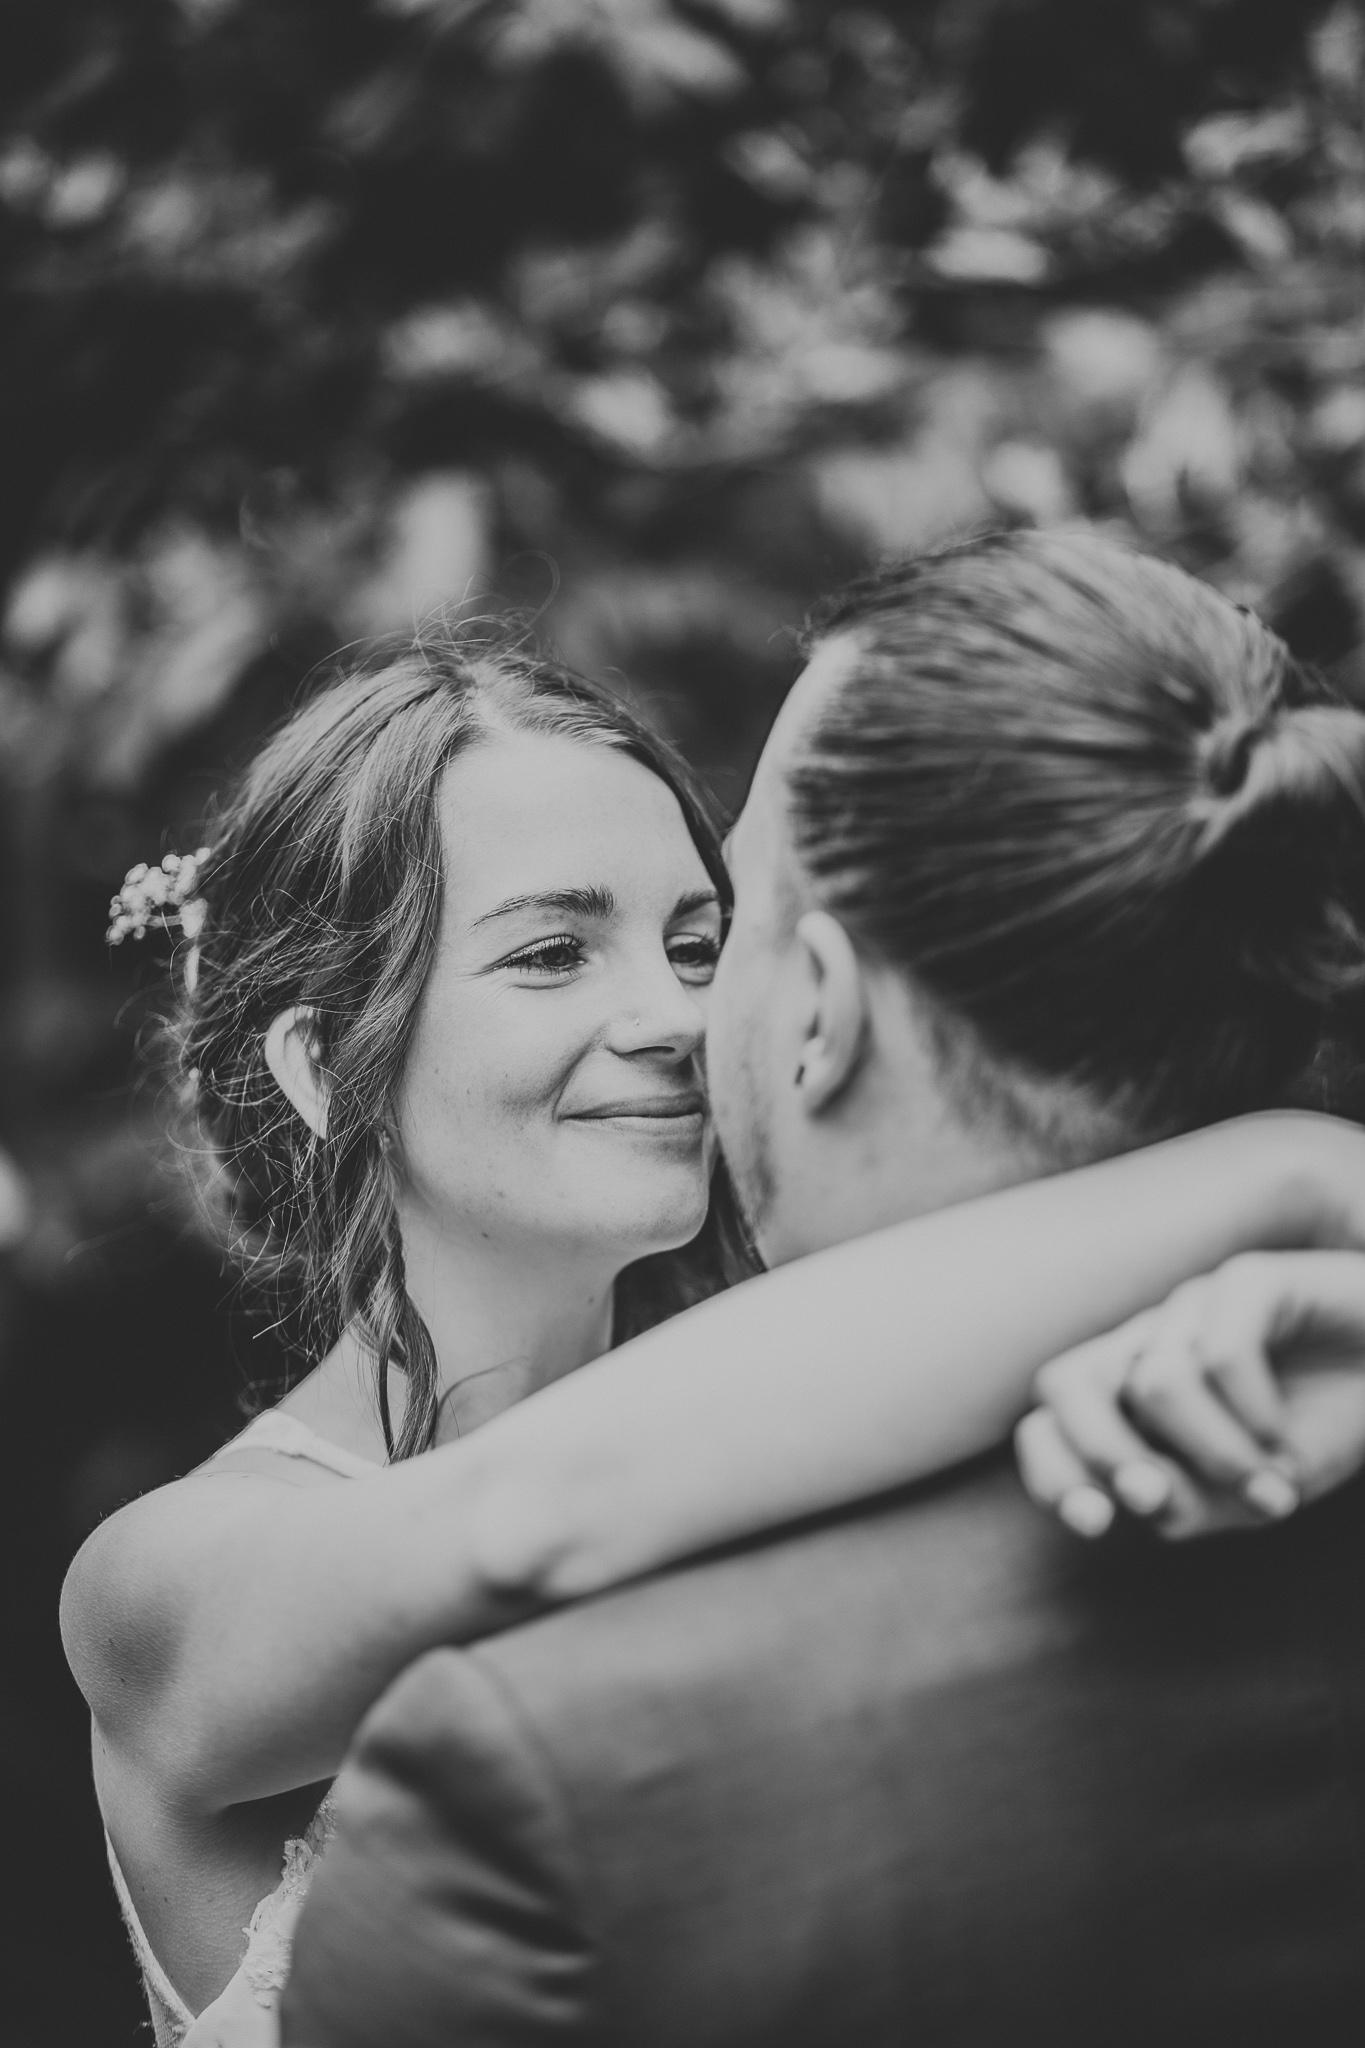 bride close up black and white portrait